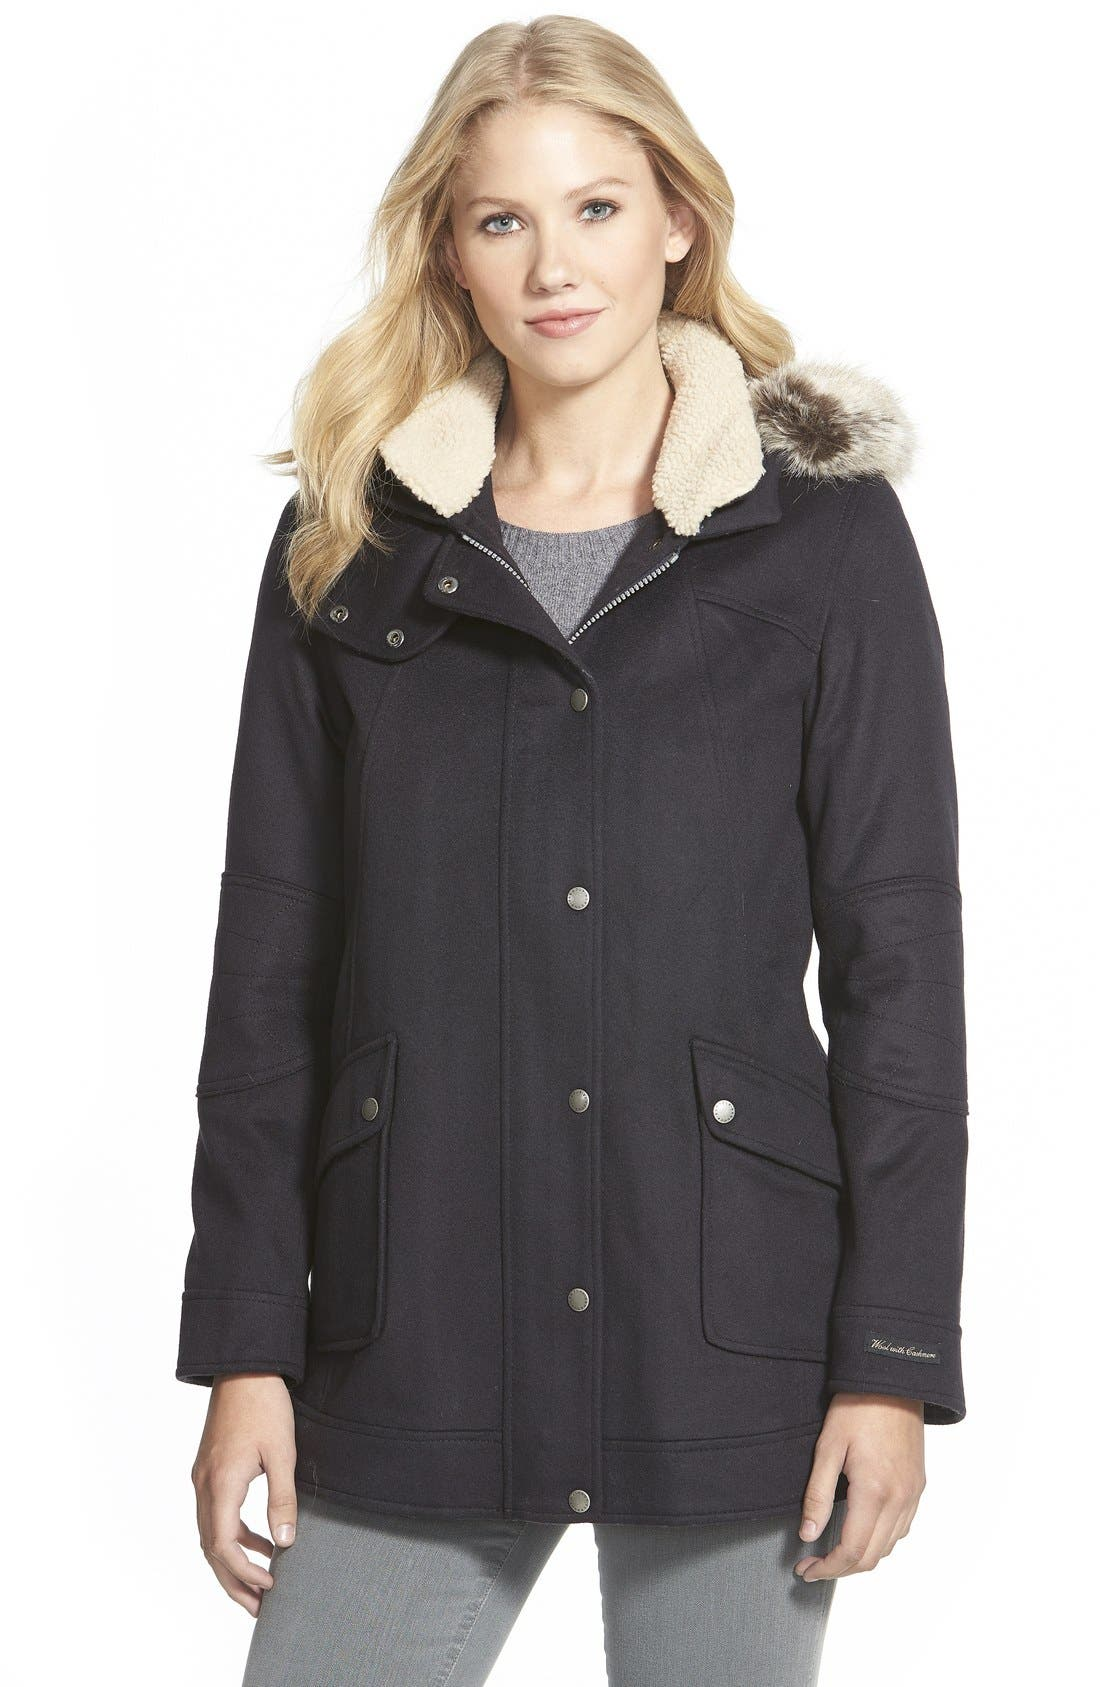 Alternate Image 1 Selected - Barbour 'Carston' Faux Fur Trim Hooded Wool Blend Jacket